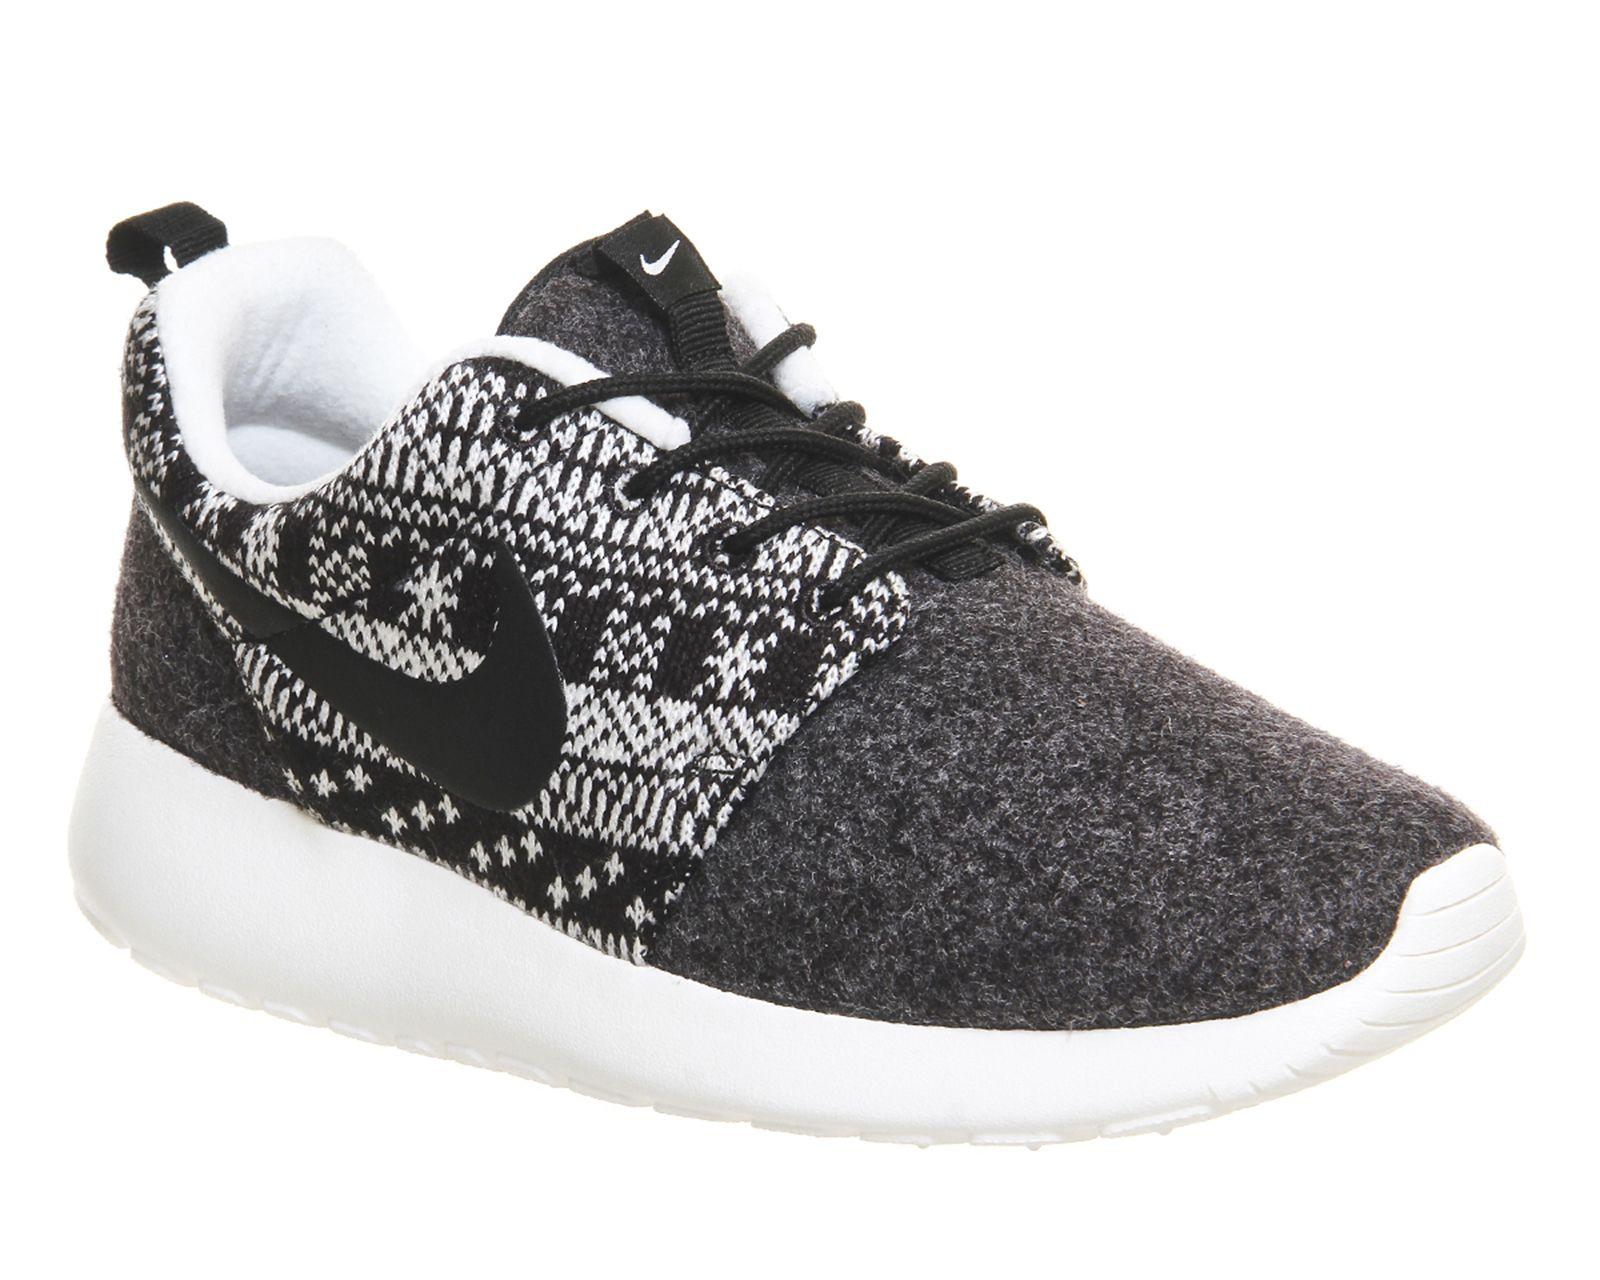 Nike – Roshe Run – Black Sail One Winter